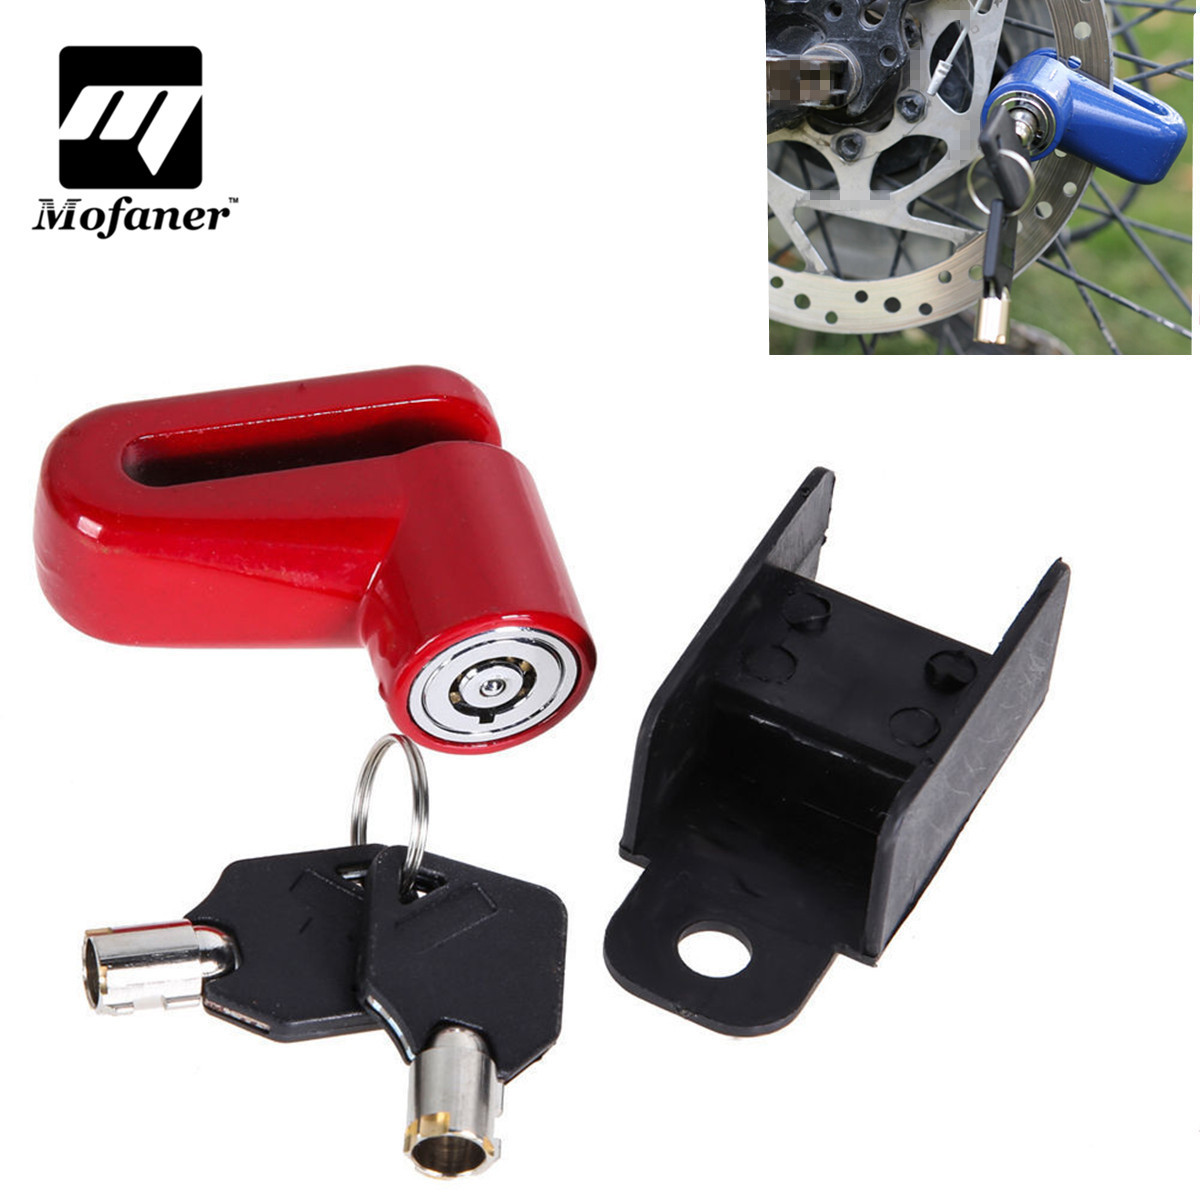 Mofaner Motorcycle Scooter Bicycle Disc Lock Anti-theft Disk Disc Brake Rotor Lock For Kawasaki For Honda